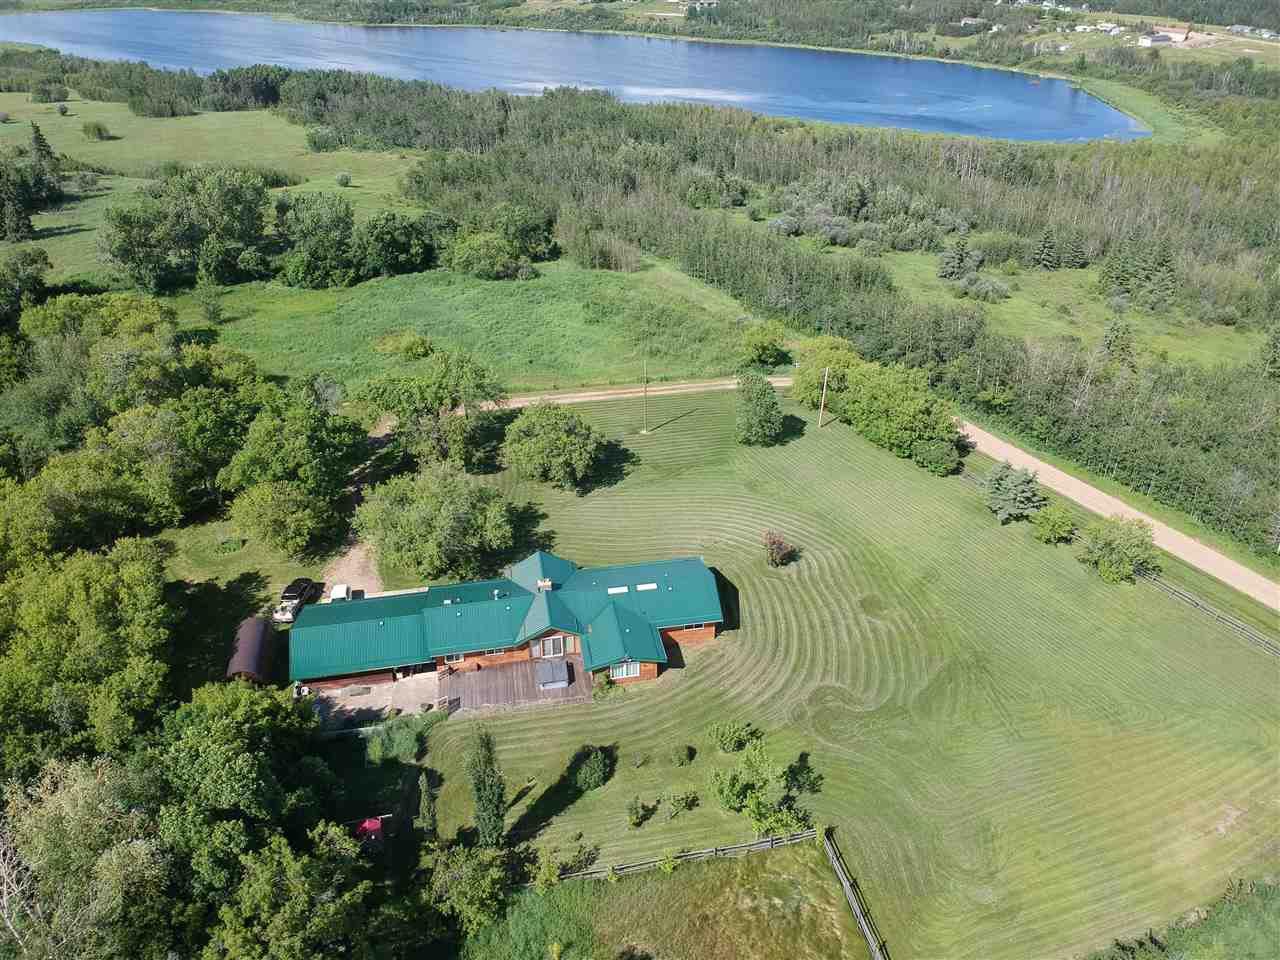 Main Photo: 57302 RGE RD 234: Rural Sturgeon County House for sale : MLS®# E4193353